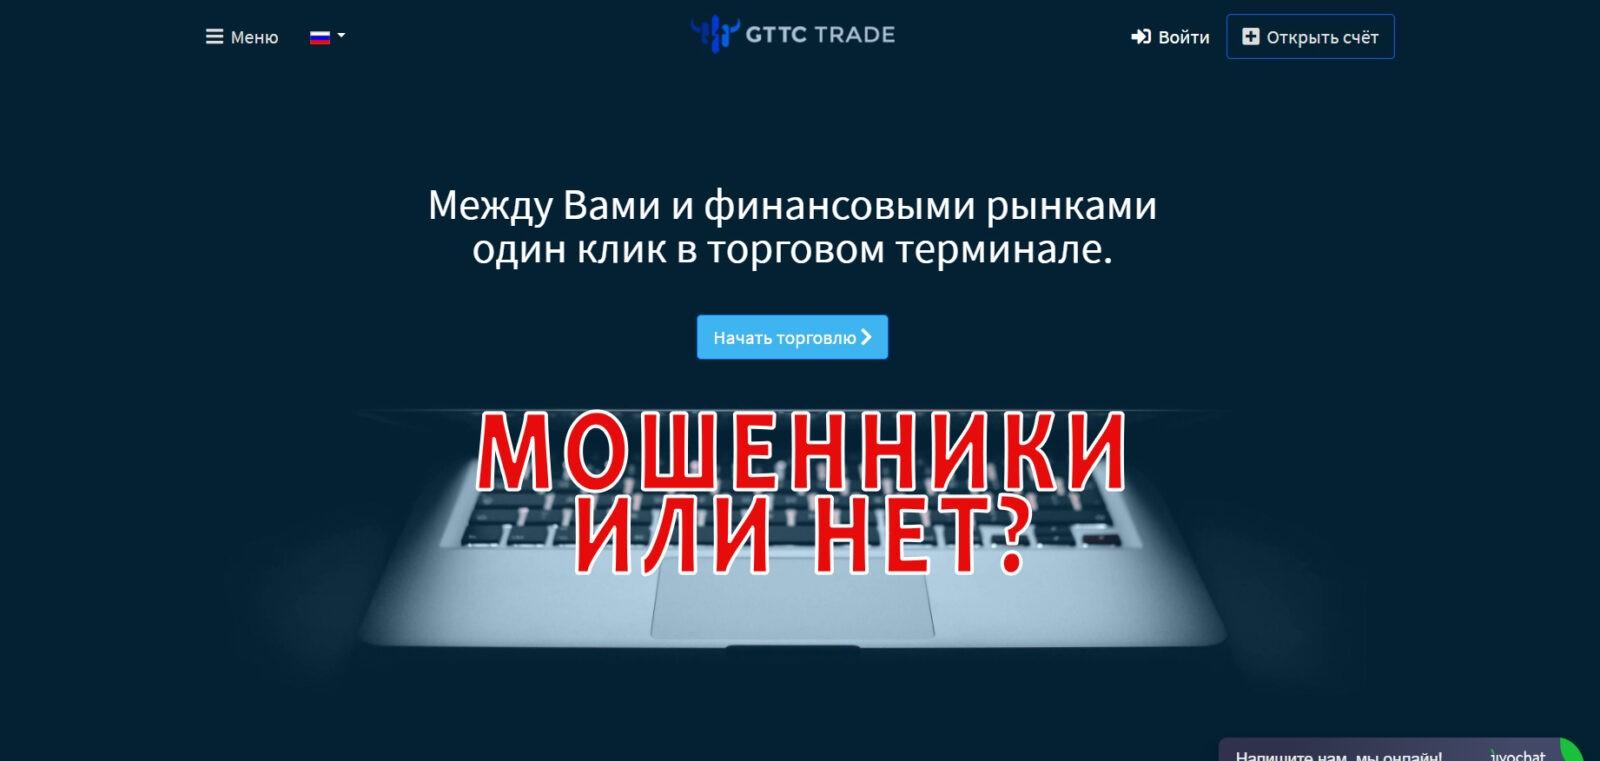 GTTC Trade